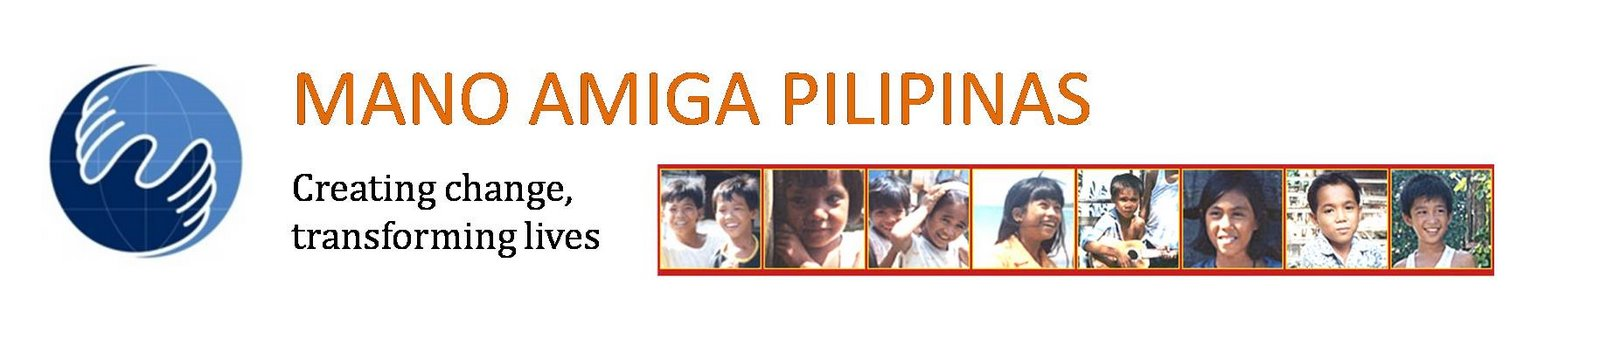 Mano Amiga Pilipinas